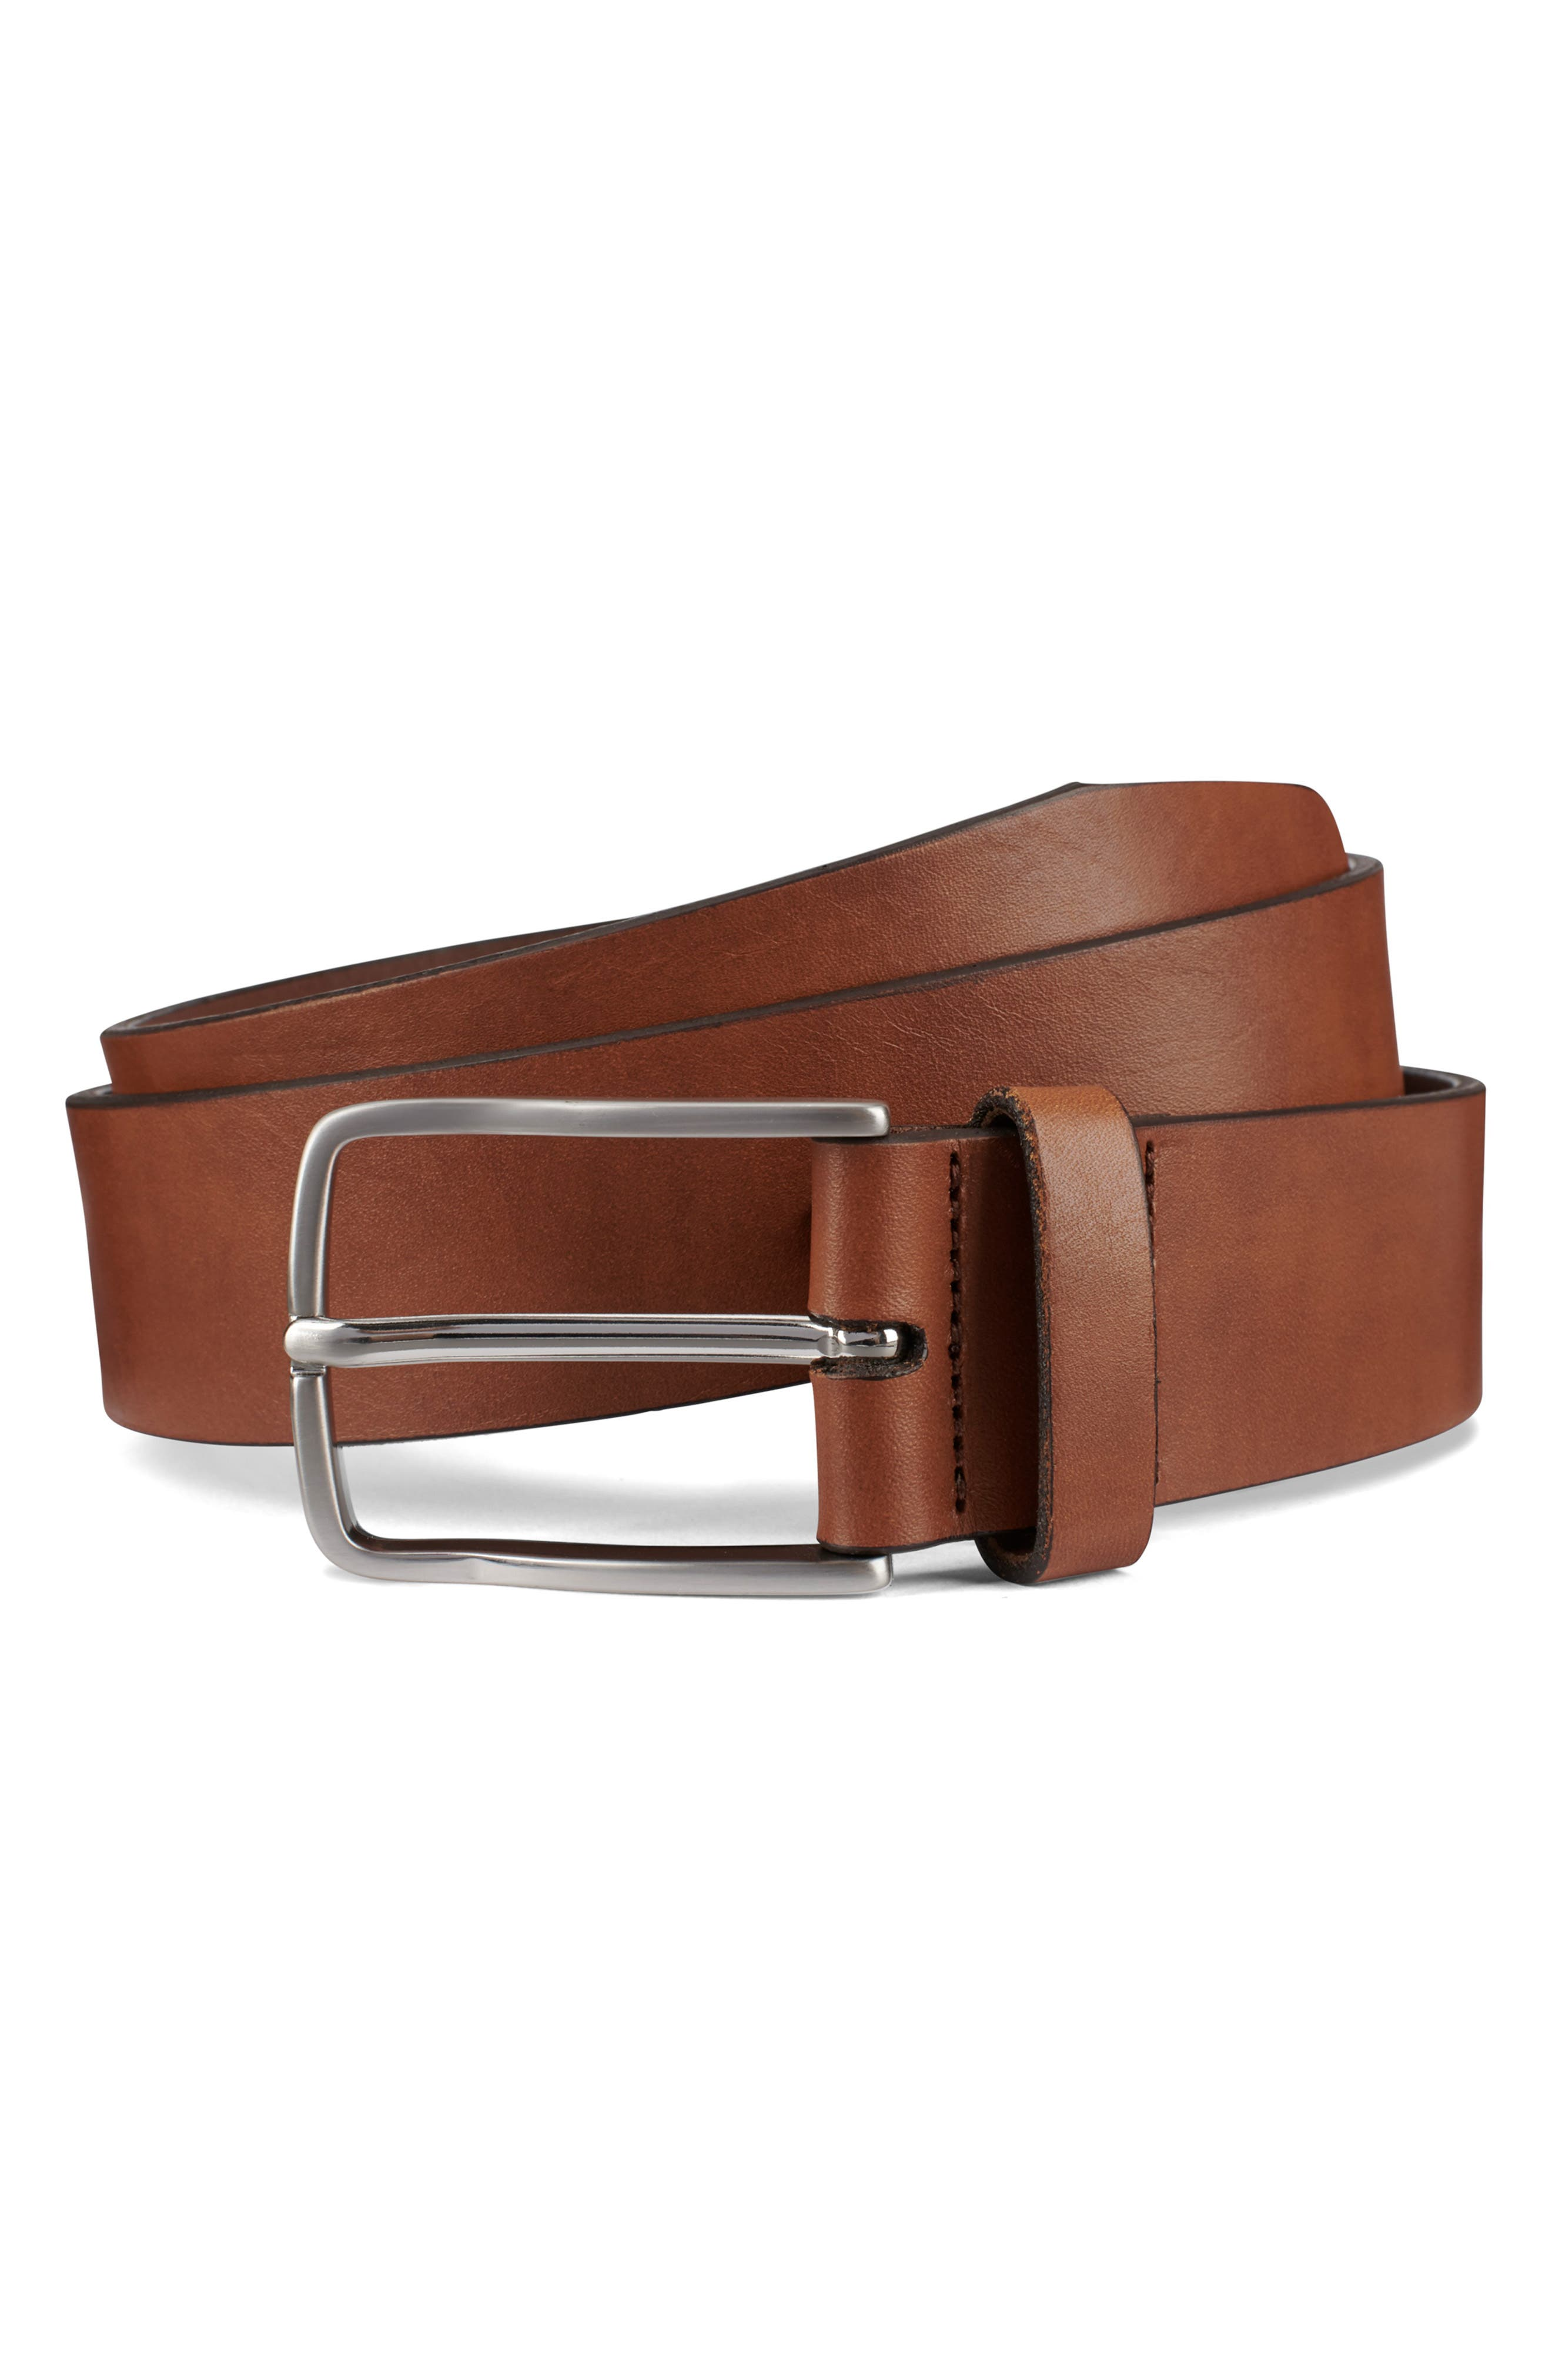 Broadway Avenue Leather Belt